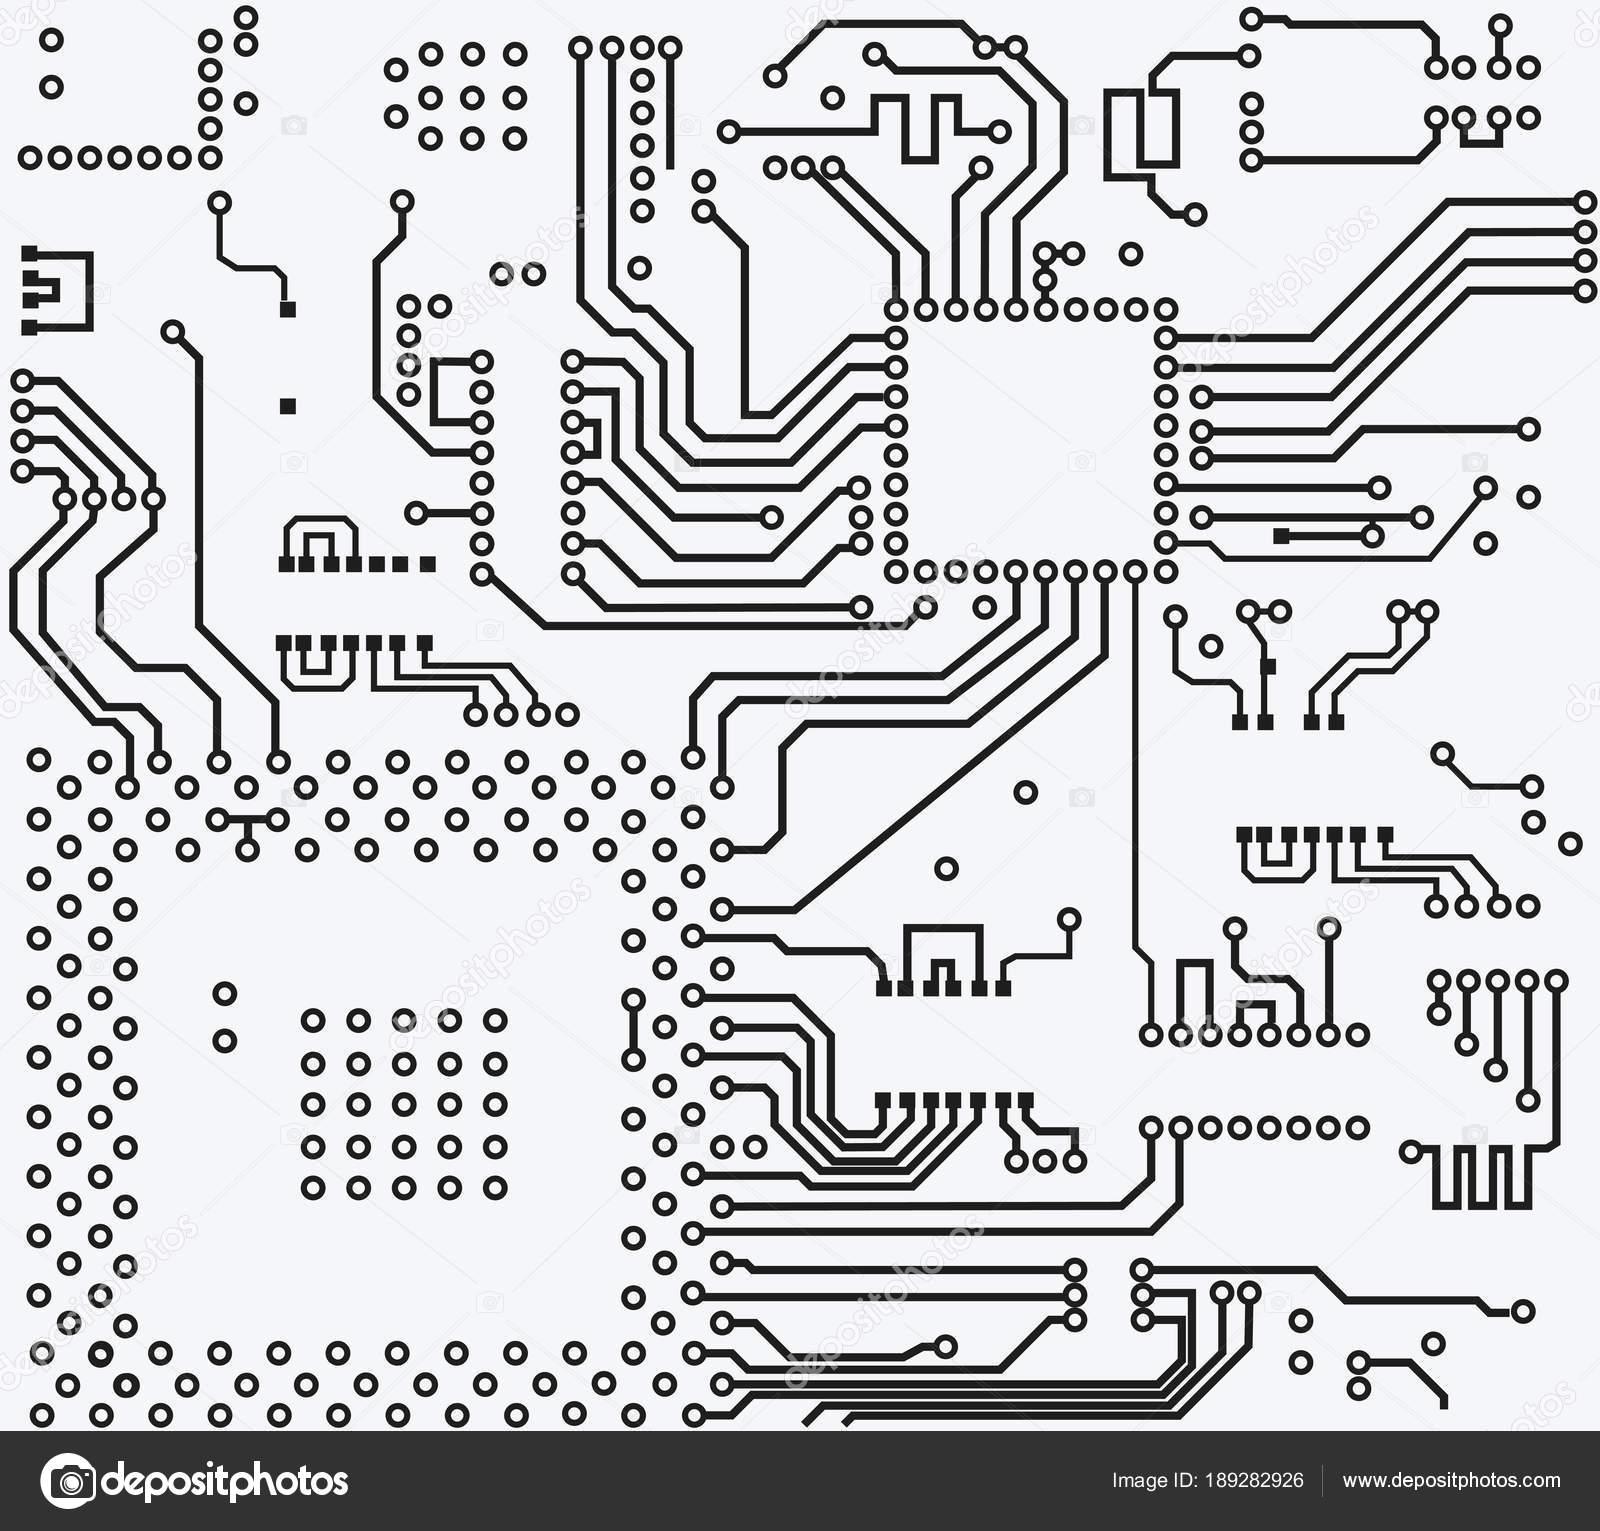 High Tech Electronic Circuit Board Vector Background Stock Electric Diagram